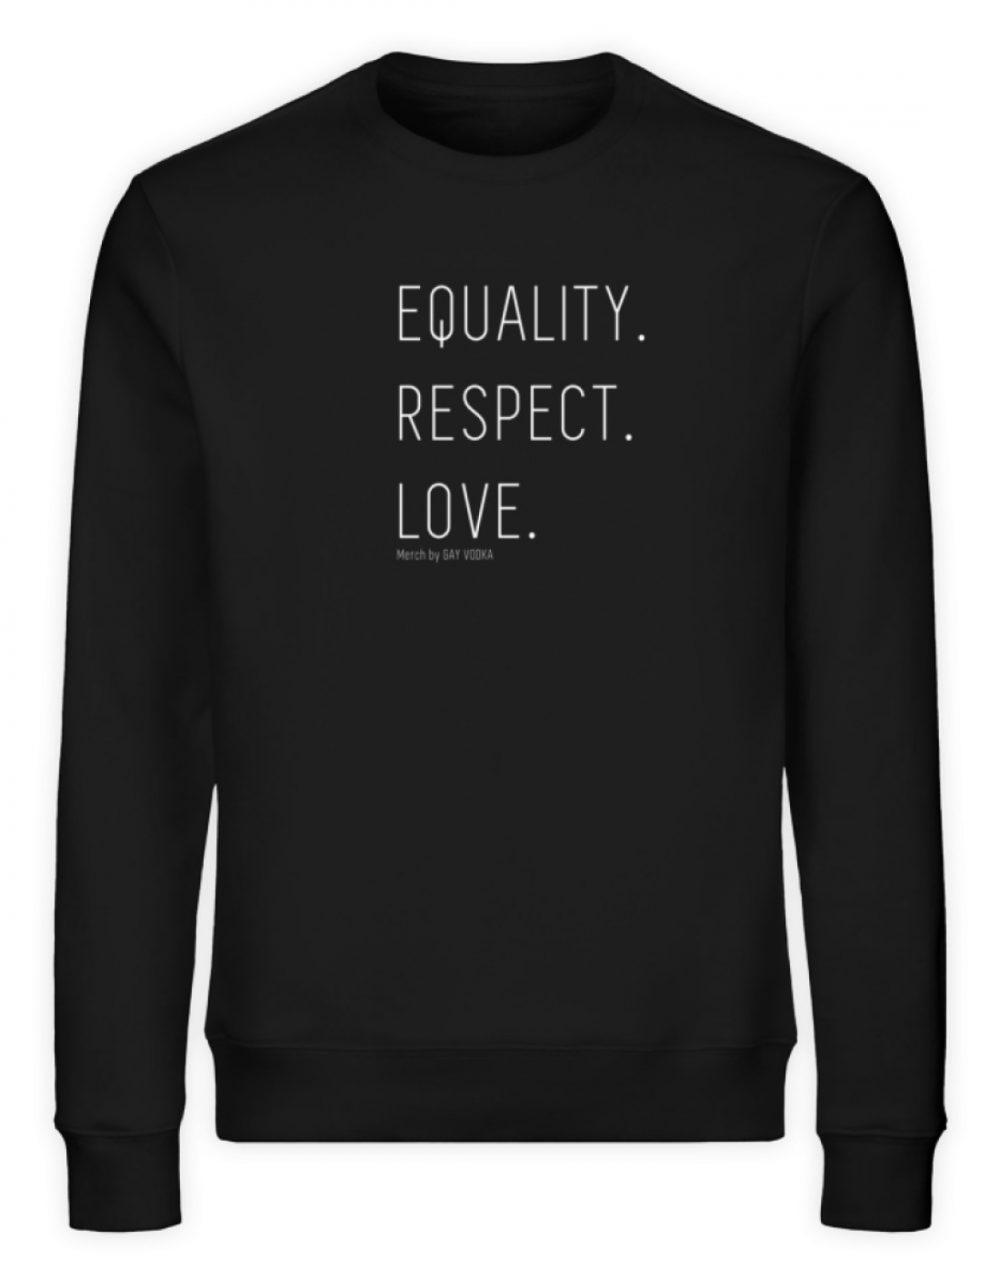 EQUALITY. RESPECT. LOVE. - Unisex Organic Sweatshirt-16